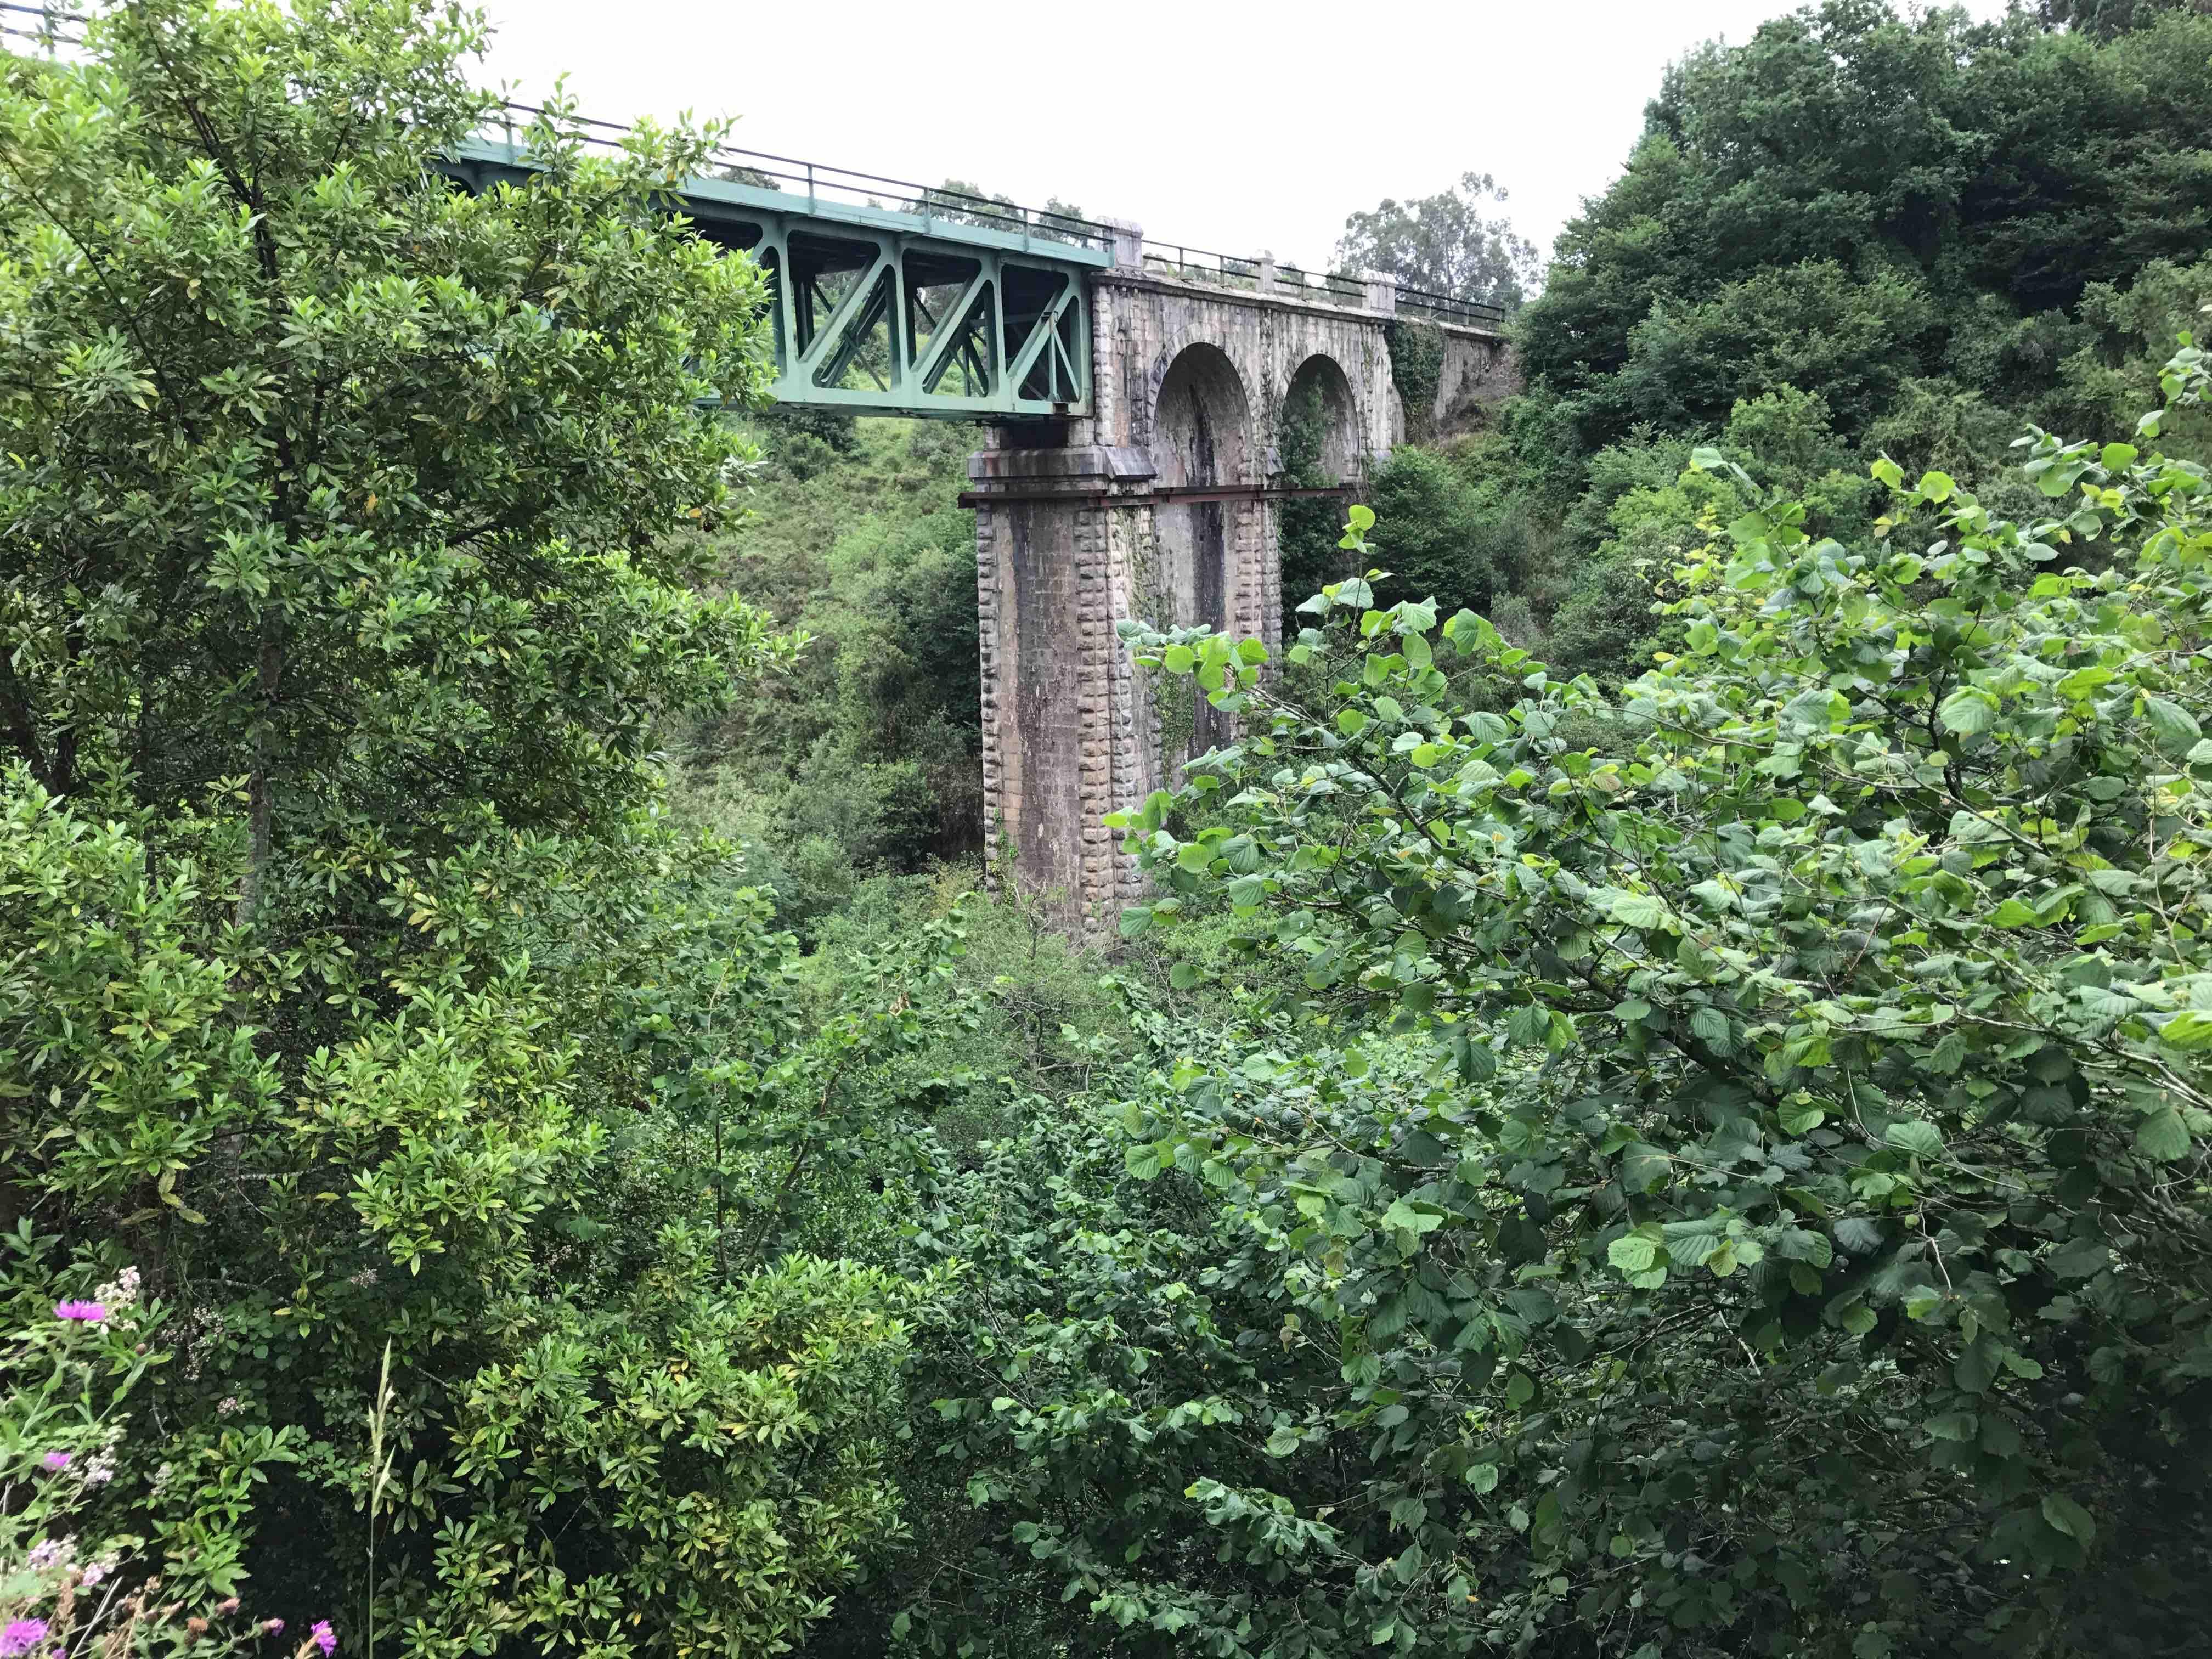 26 Puente del ferrocarril